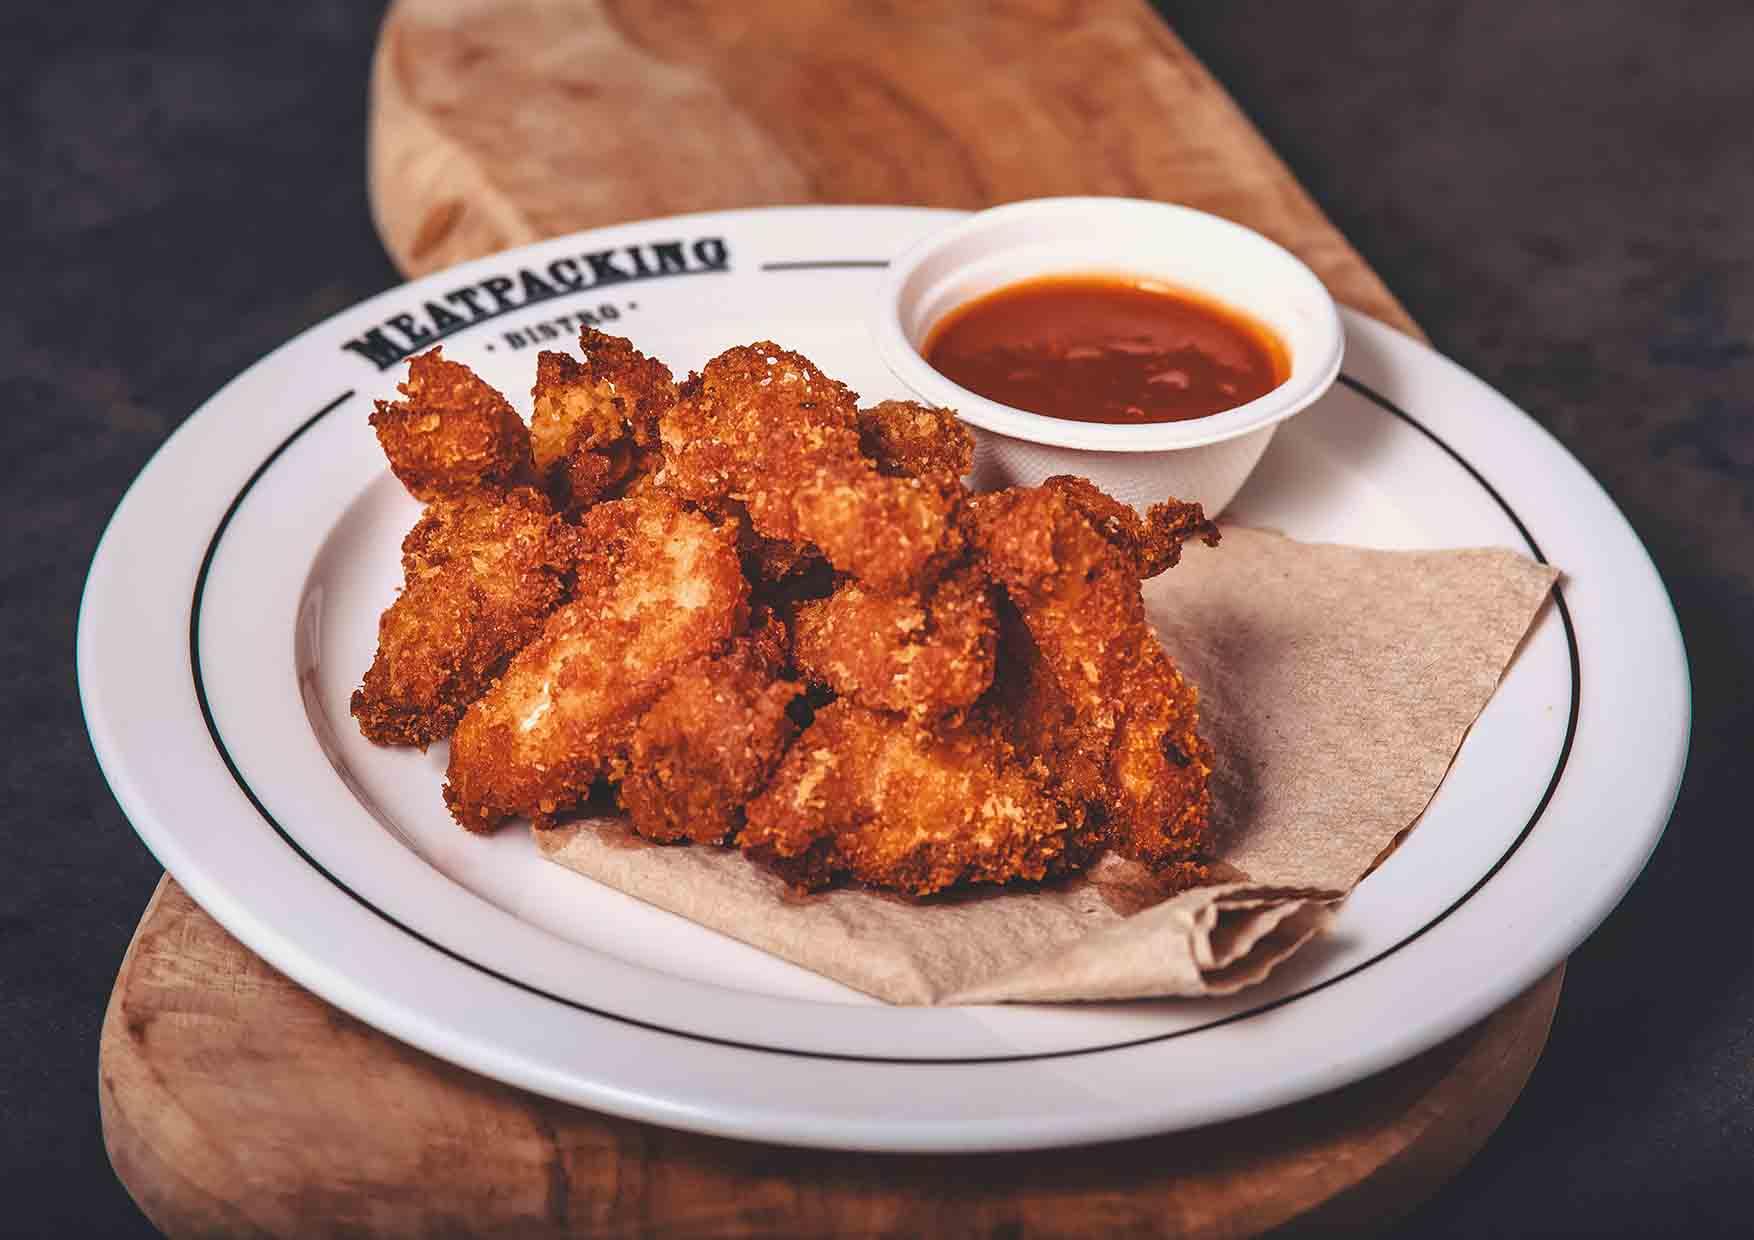 Chicken Fingers - comida a domicilio cerca de mi - Meatpacking